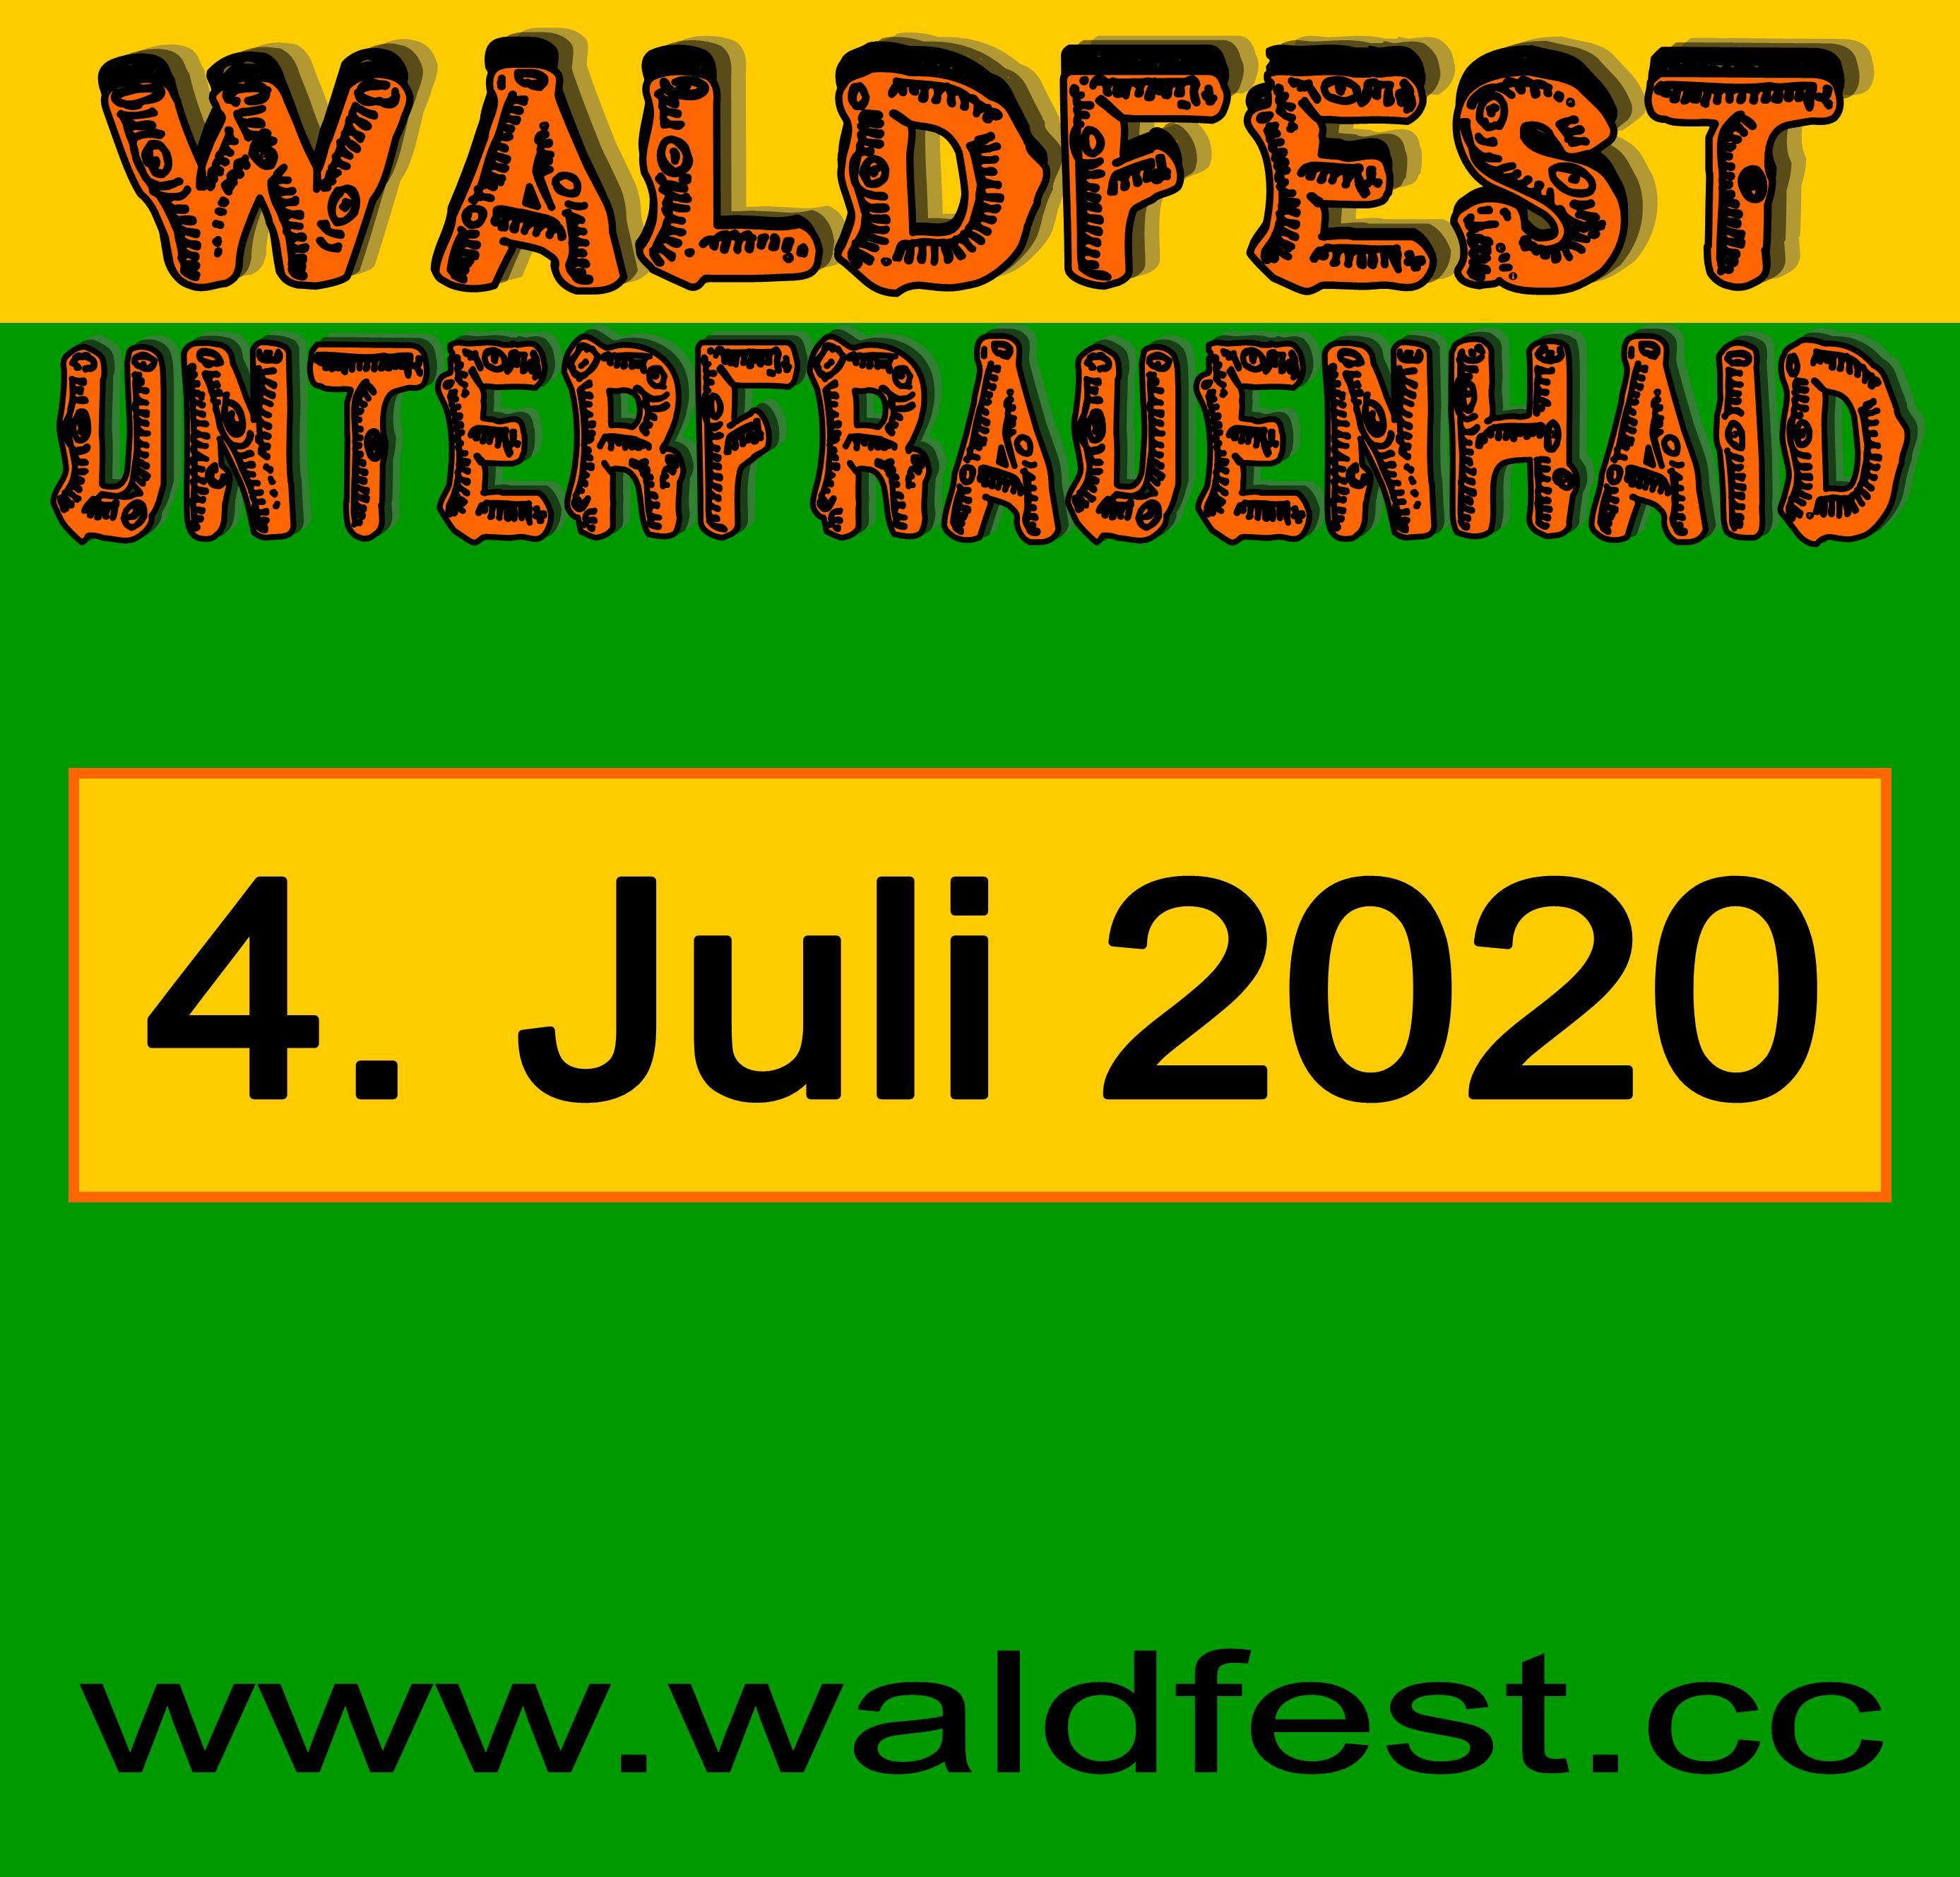 Waldfest Termin 2020